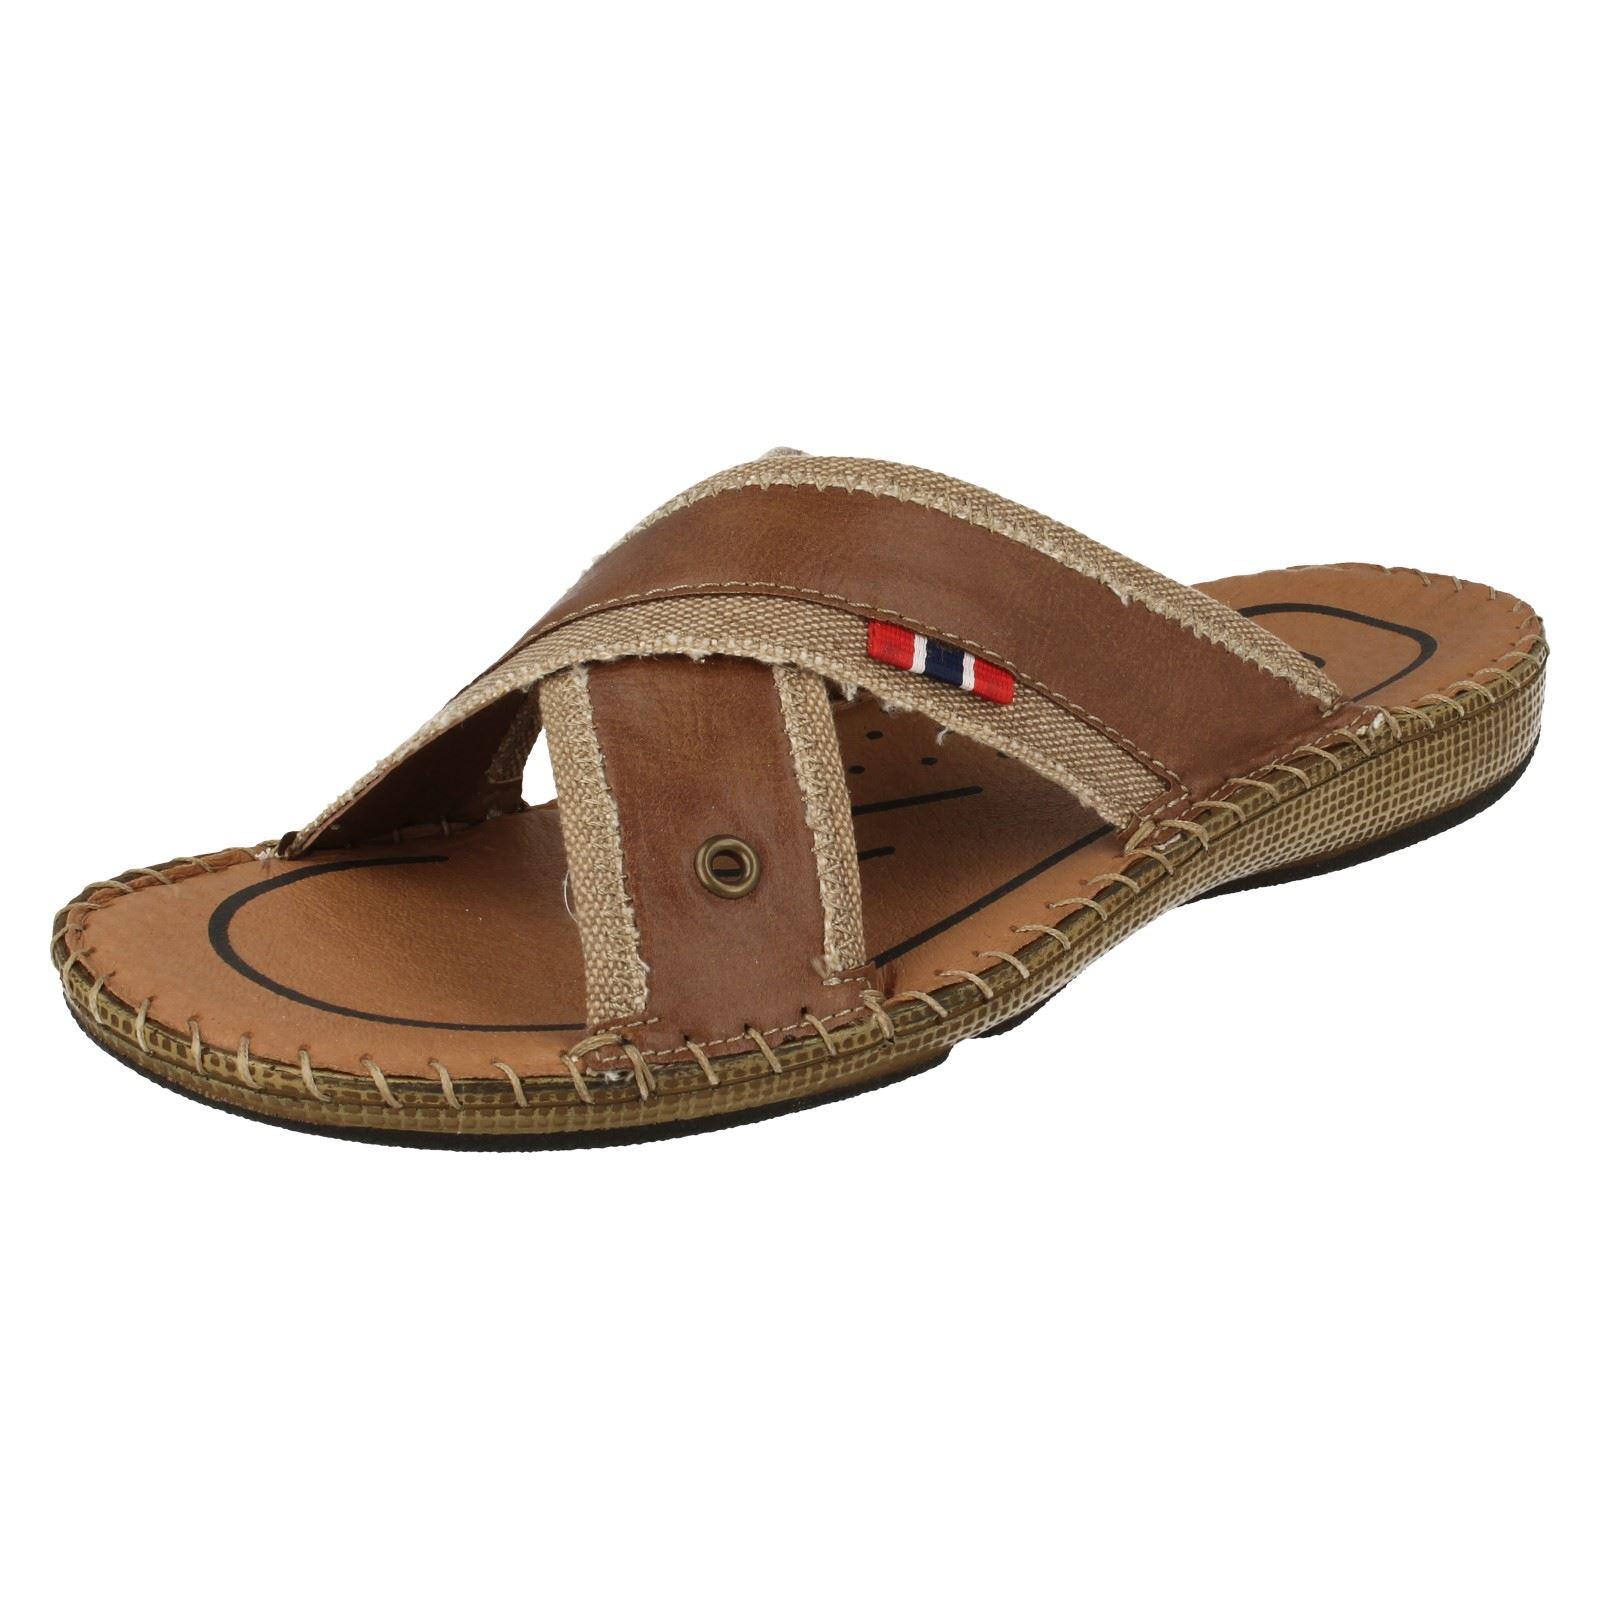 Details about Rieker Mens Slip On Sandals 20554